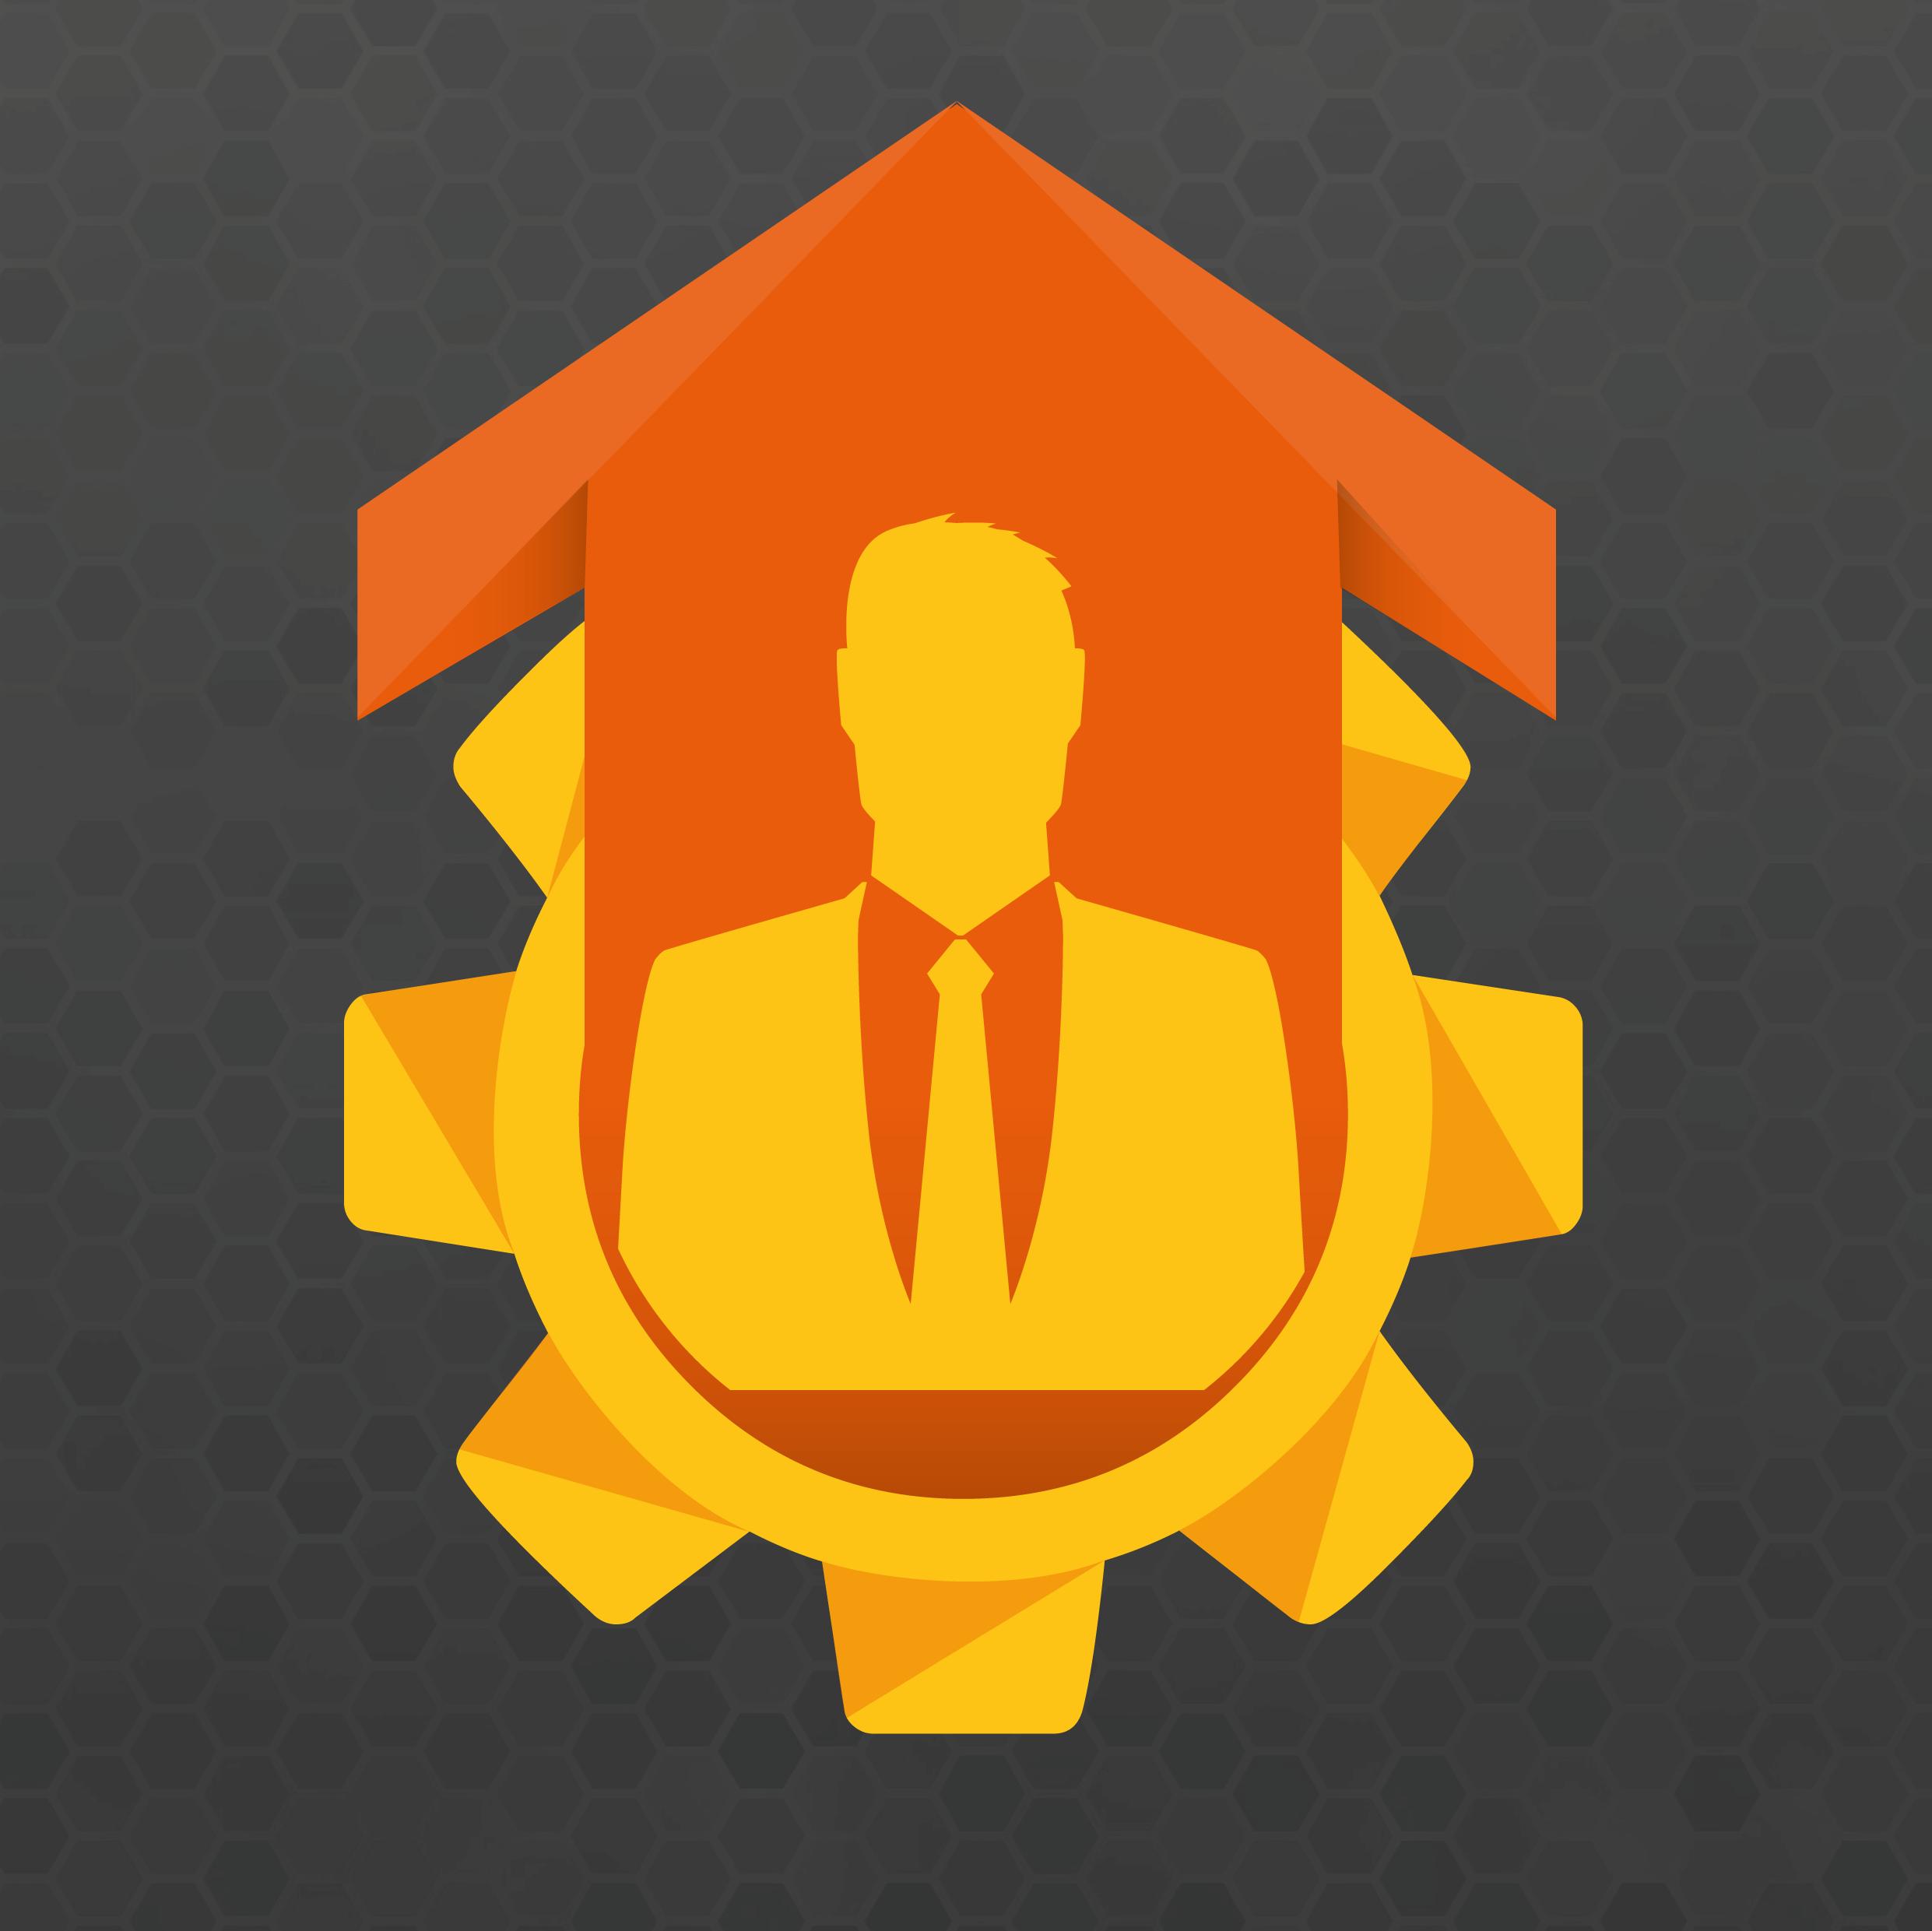 Icon Personalentwicklung